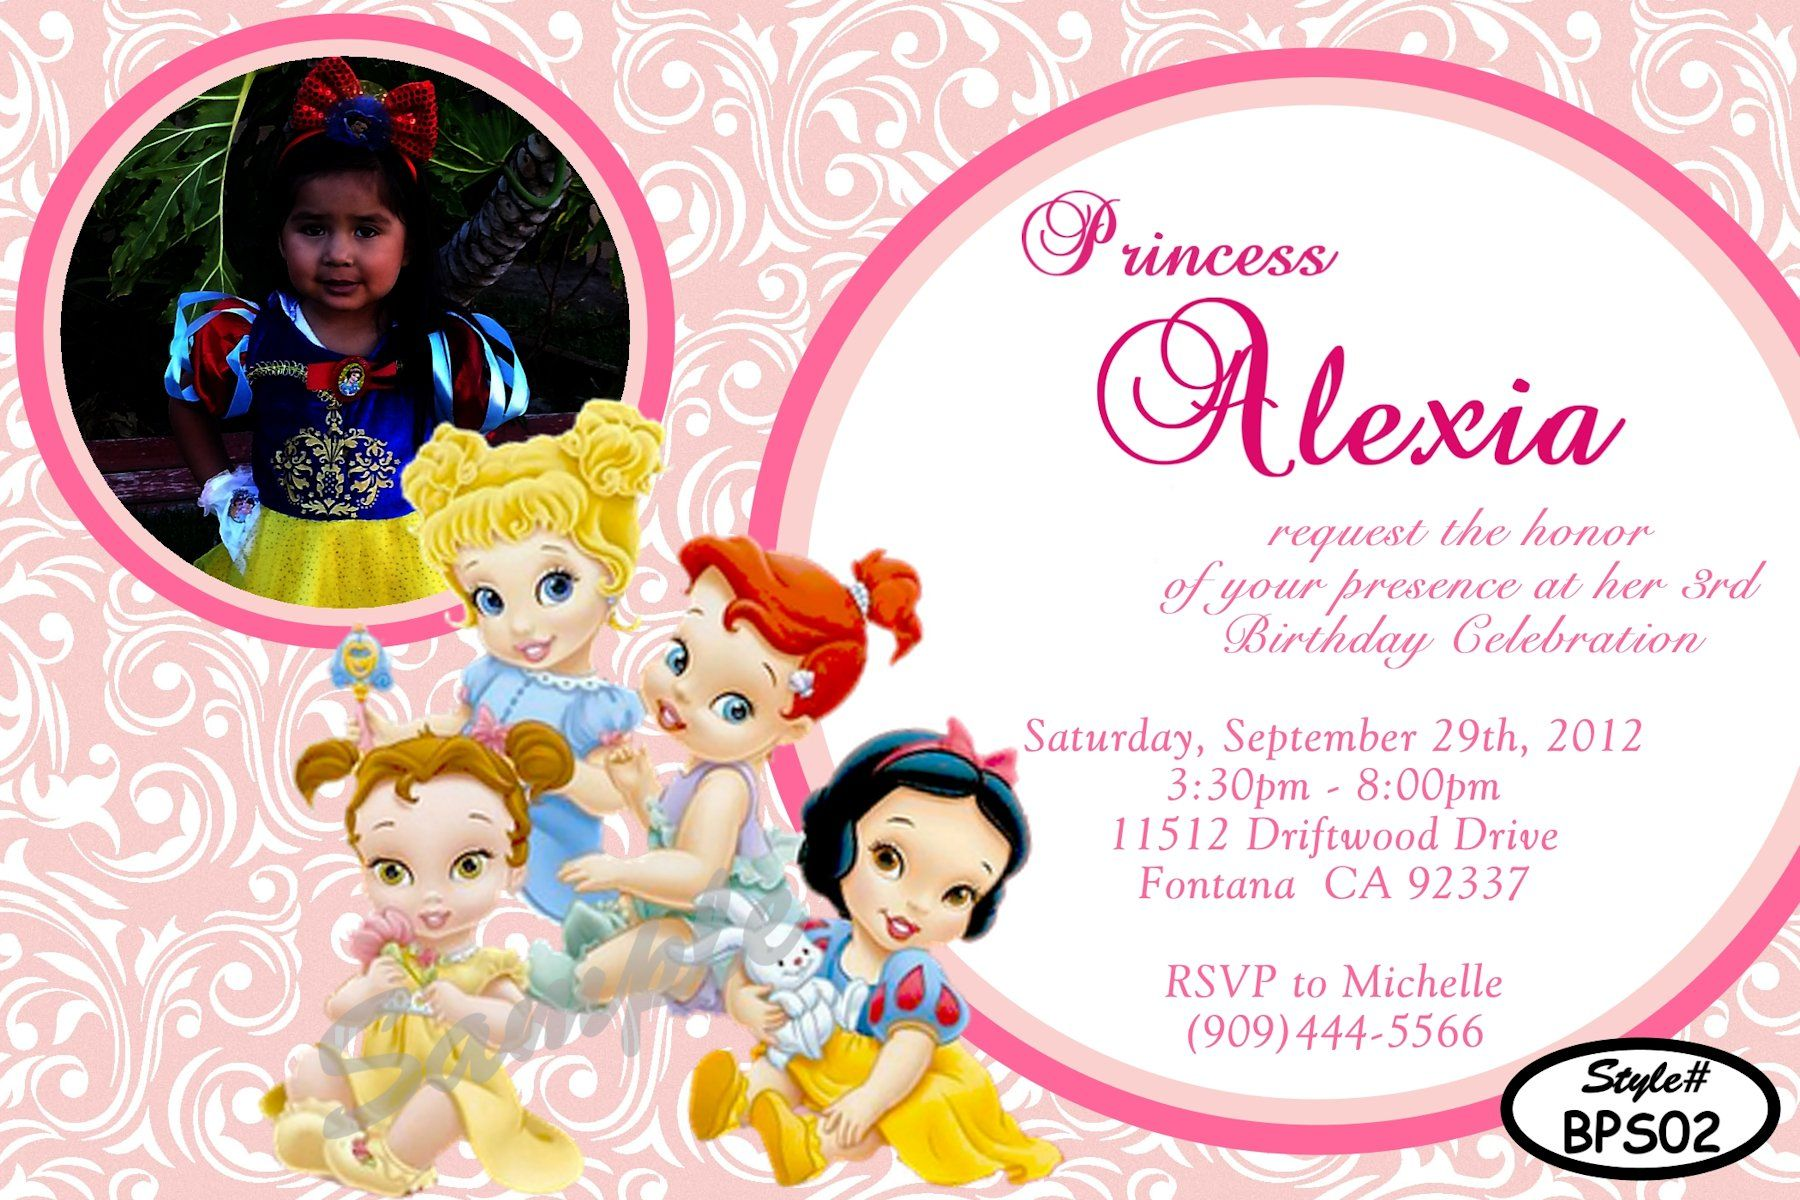 Disney Baby Princesses Birthday Invitation Digital And Printable Invite In 4x6 Or 5x7